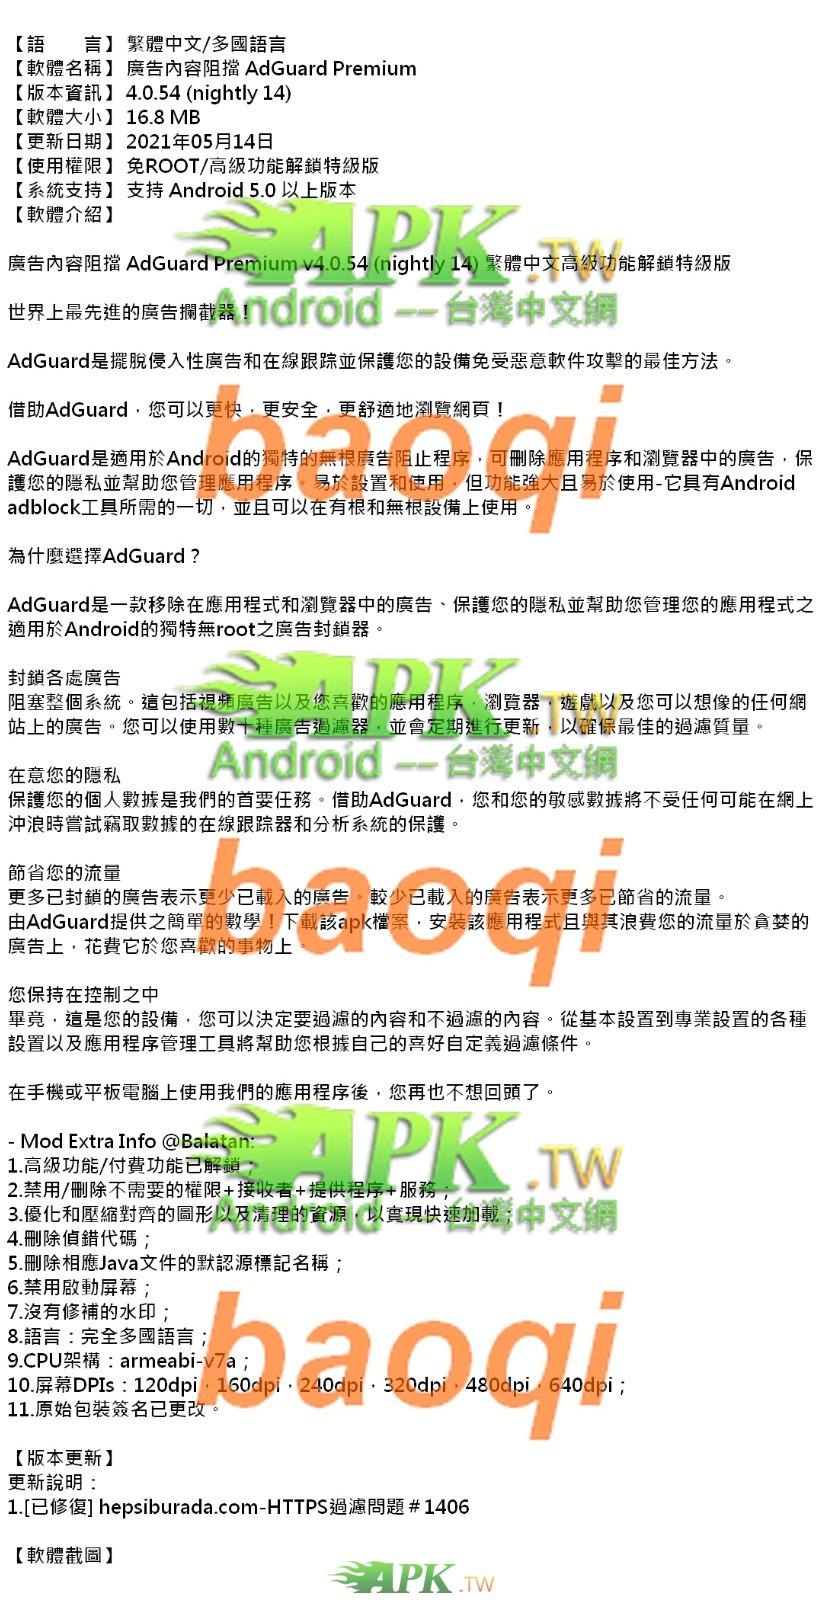 AdGuard_Premium_4.0.54_nightly14_.jpg